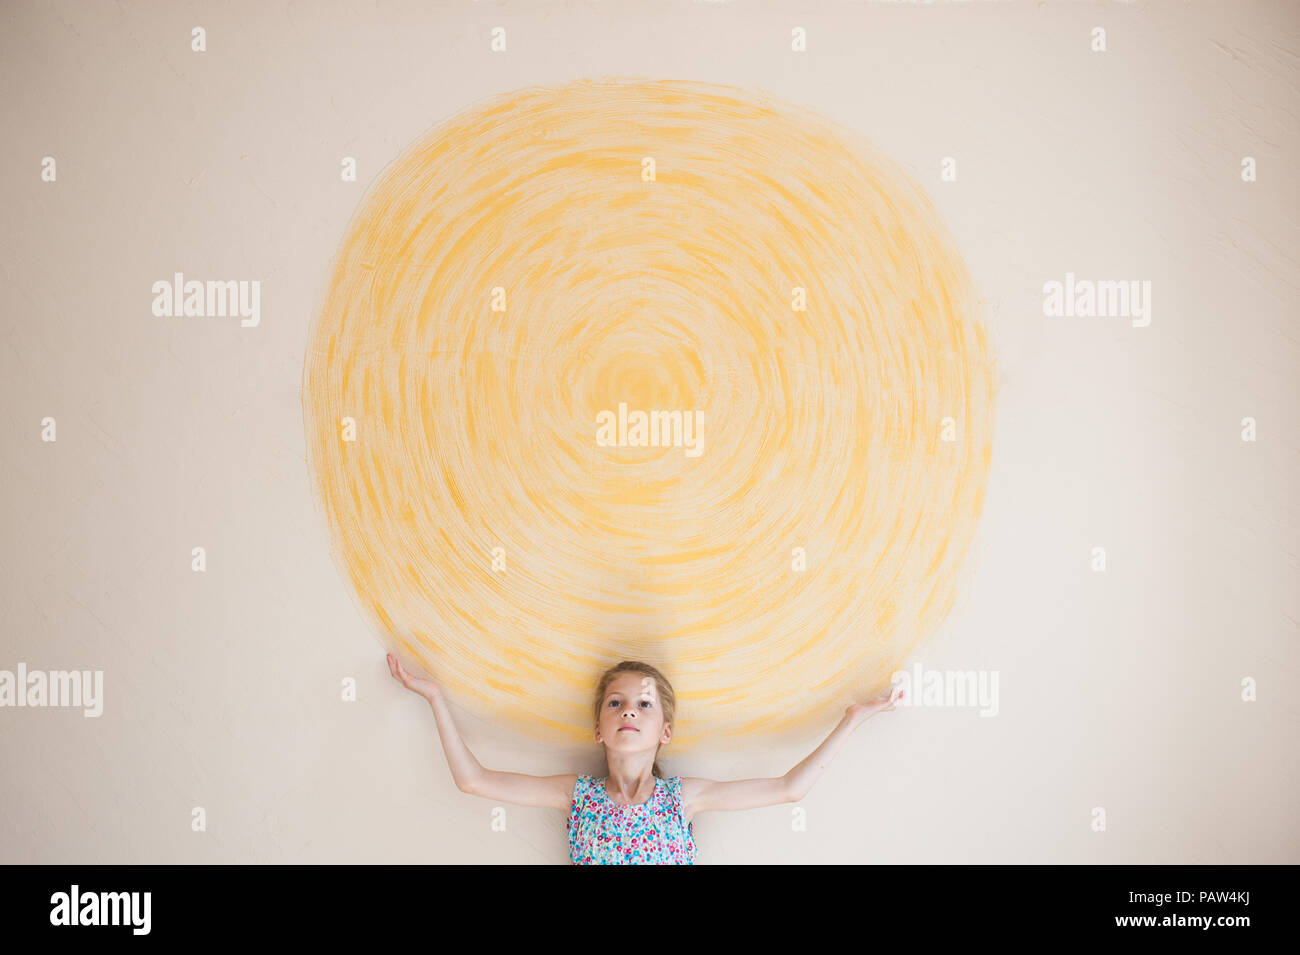 Concepto de hermosa chica sujetando caucásica sun pintado sobre la pared amarilla en interiores Imagen De Stock